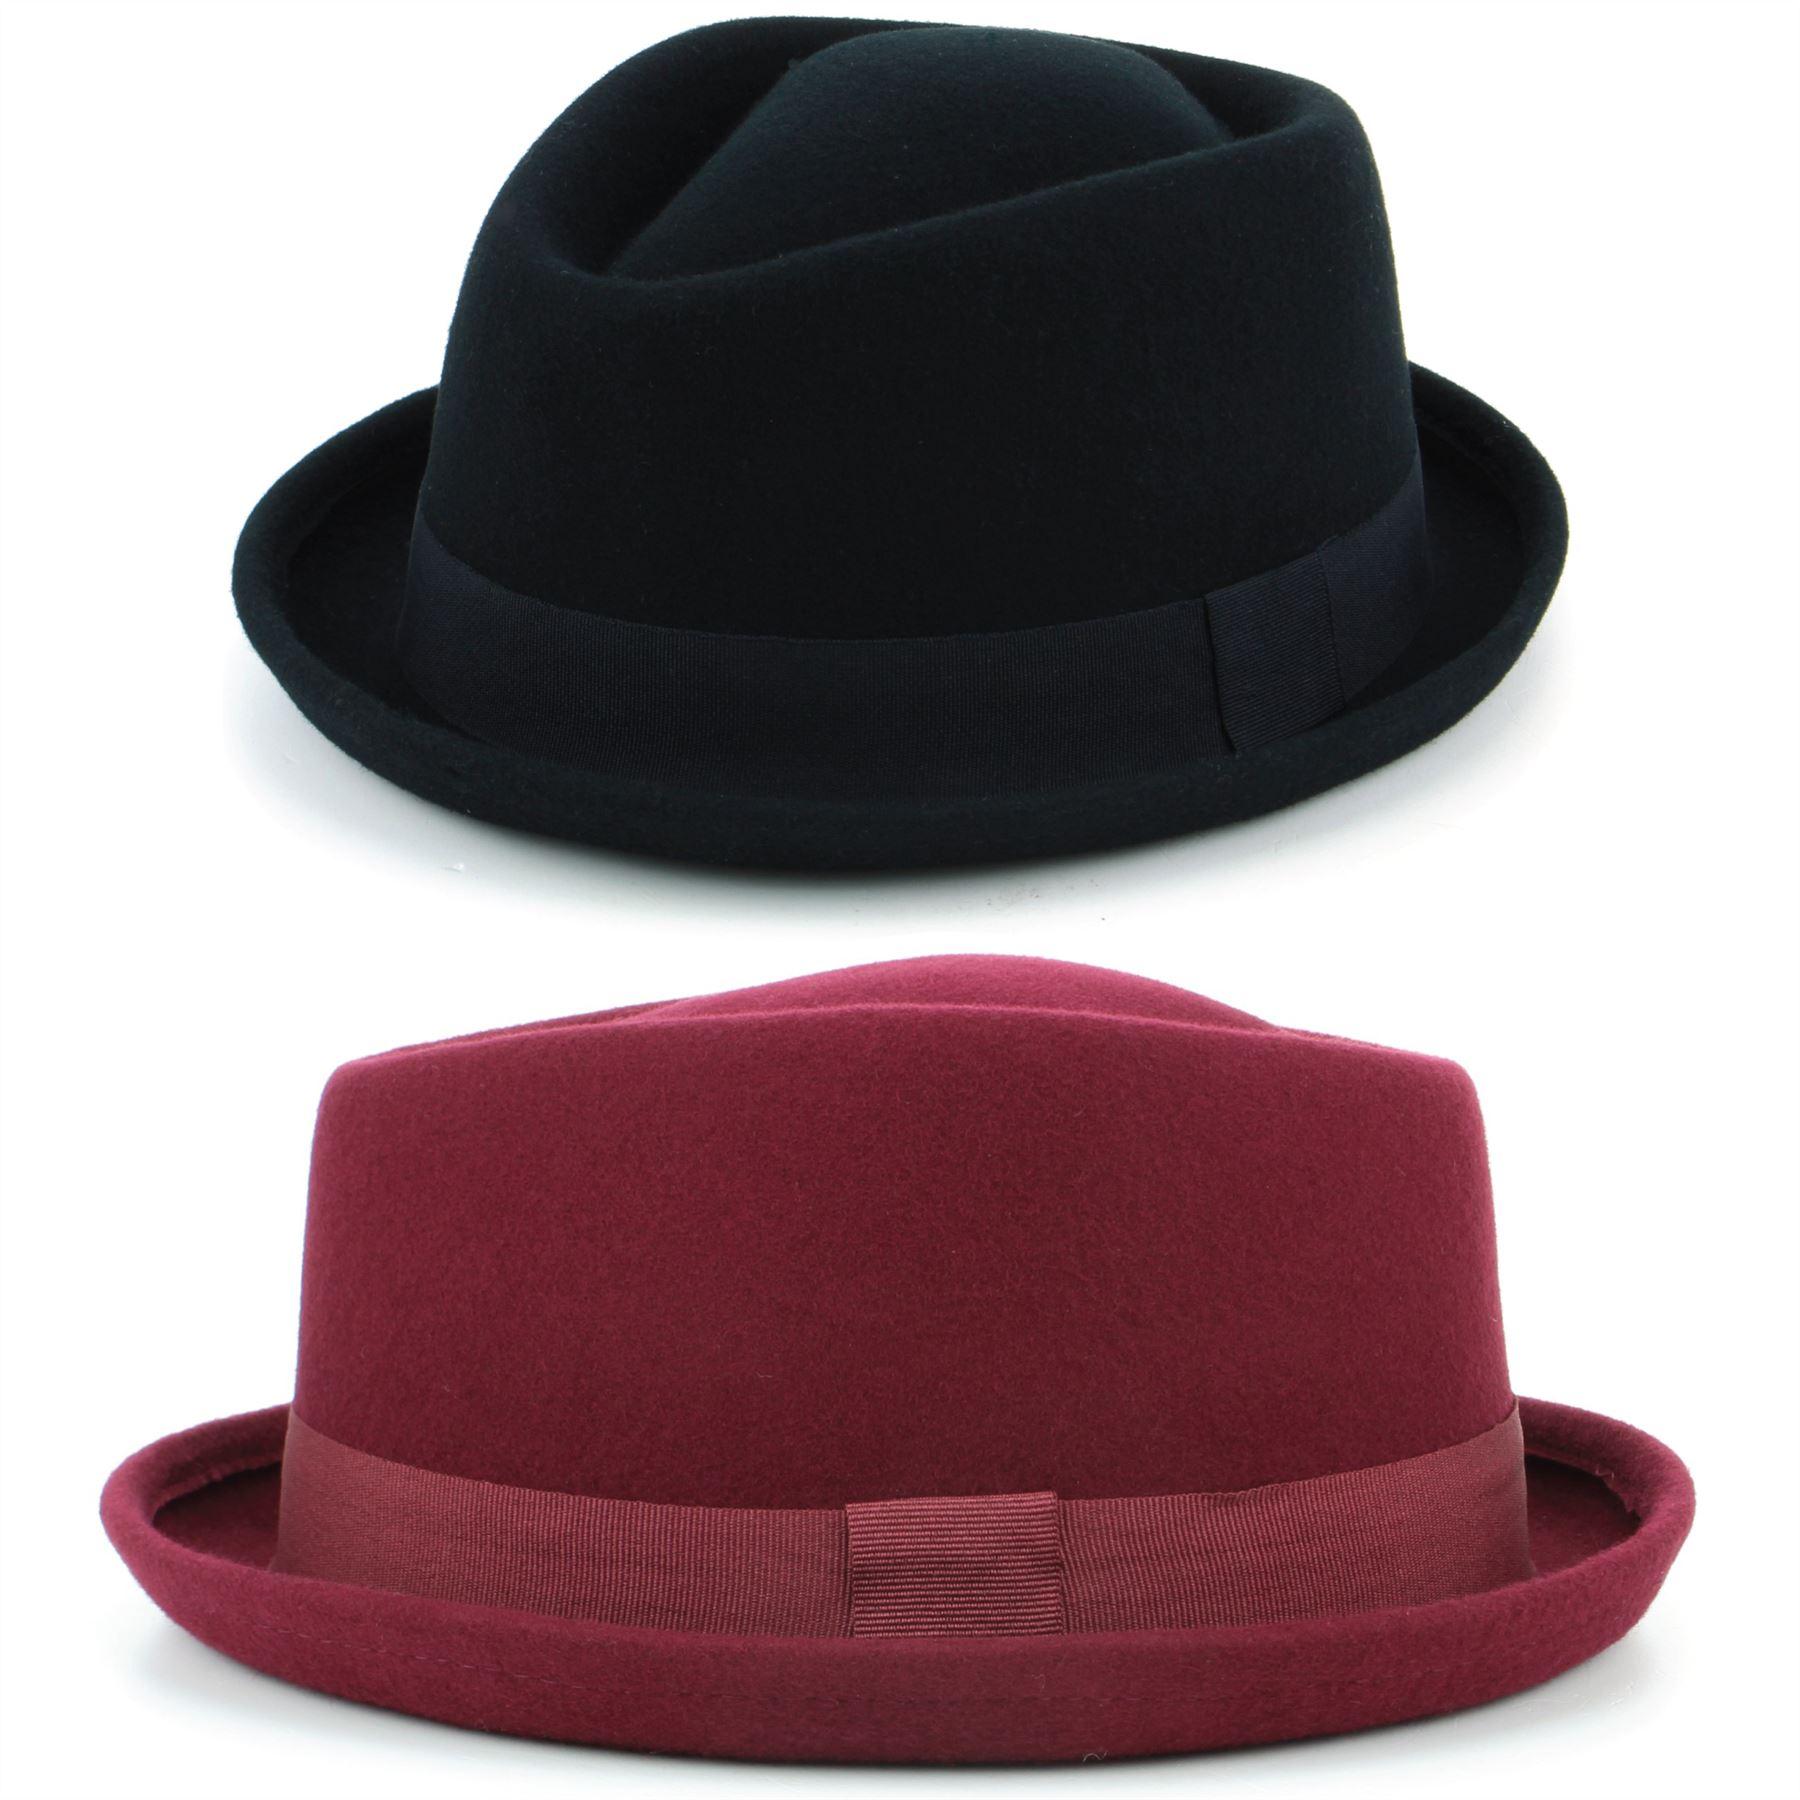 Details about Hat Porkpie Pork Pie Wool BLACK RED Trilby Unisex Diamond  Crown Retro Hawkins 10514e1b7209